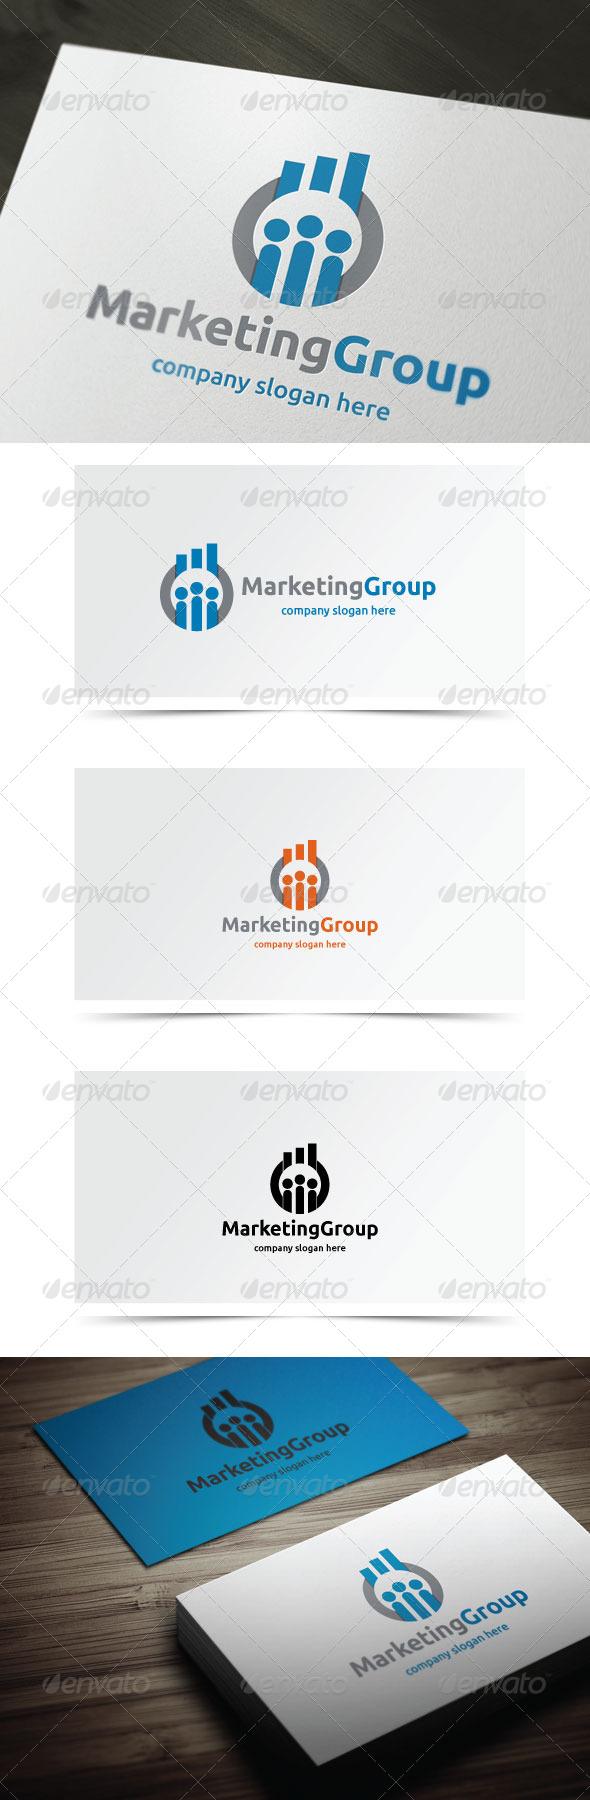 Marketing Group - Symbols Logo Templates